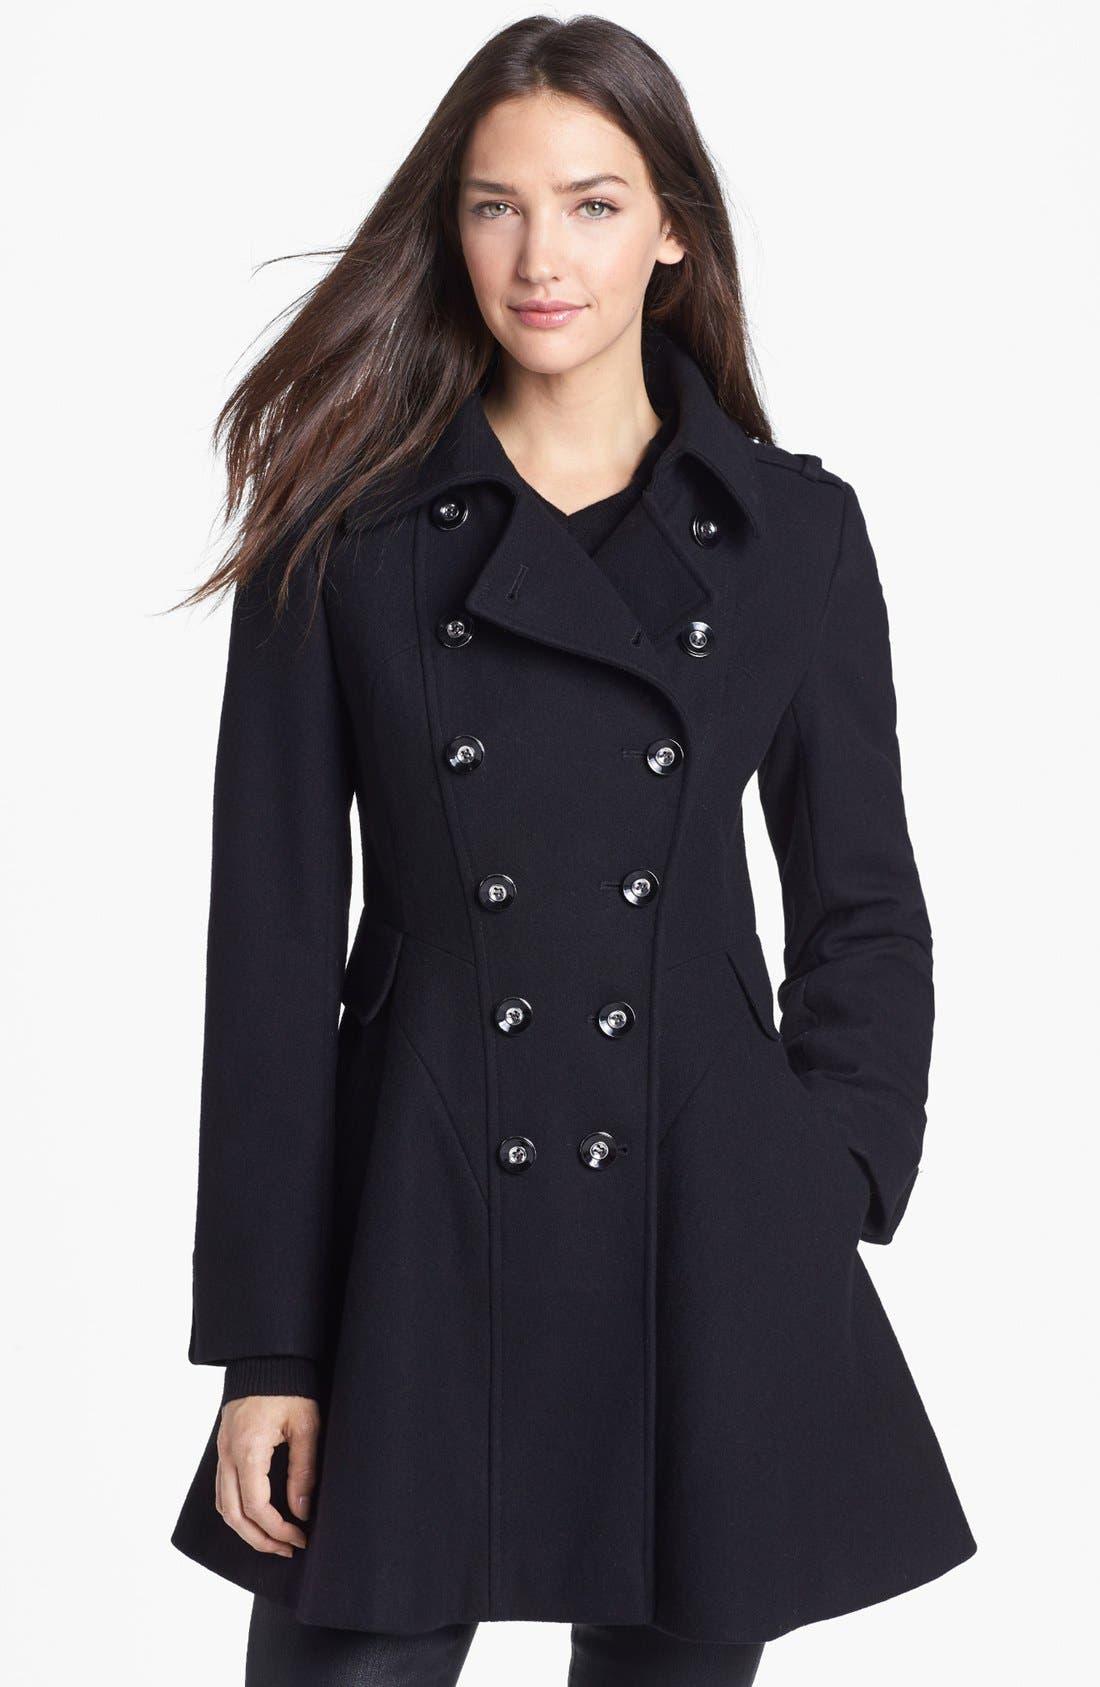 Main Image - Via Spiga Double Breasted Wool Blend Military Coat